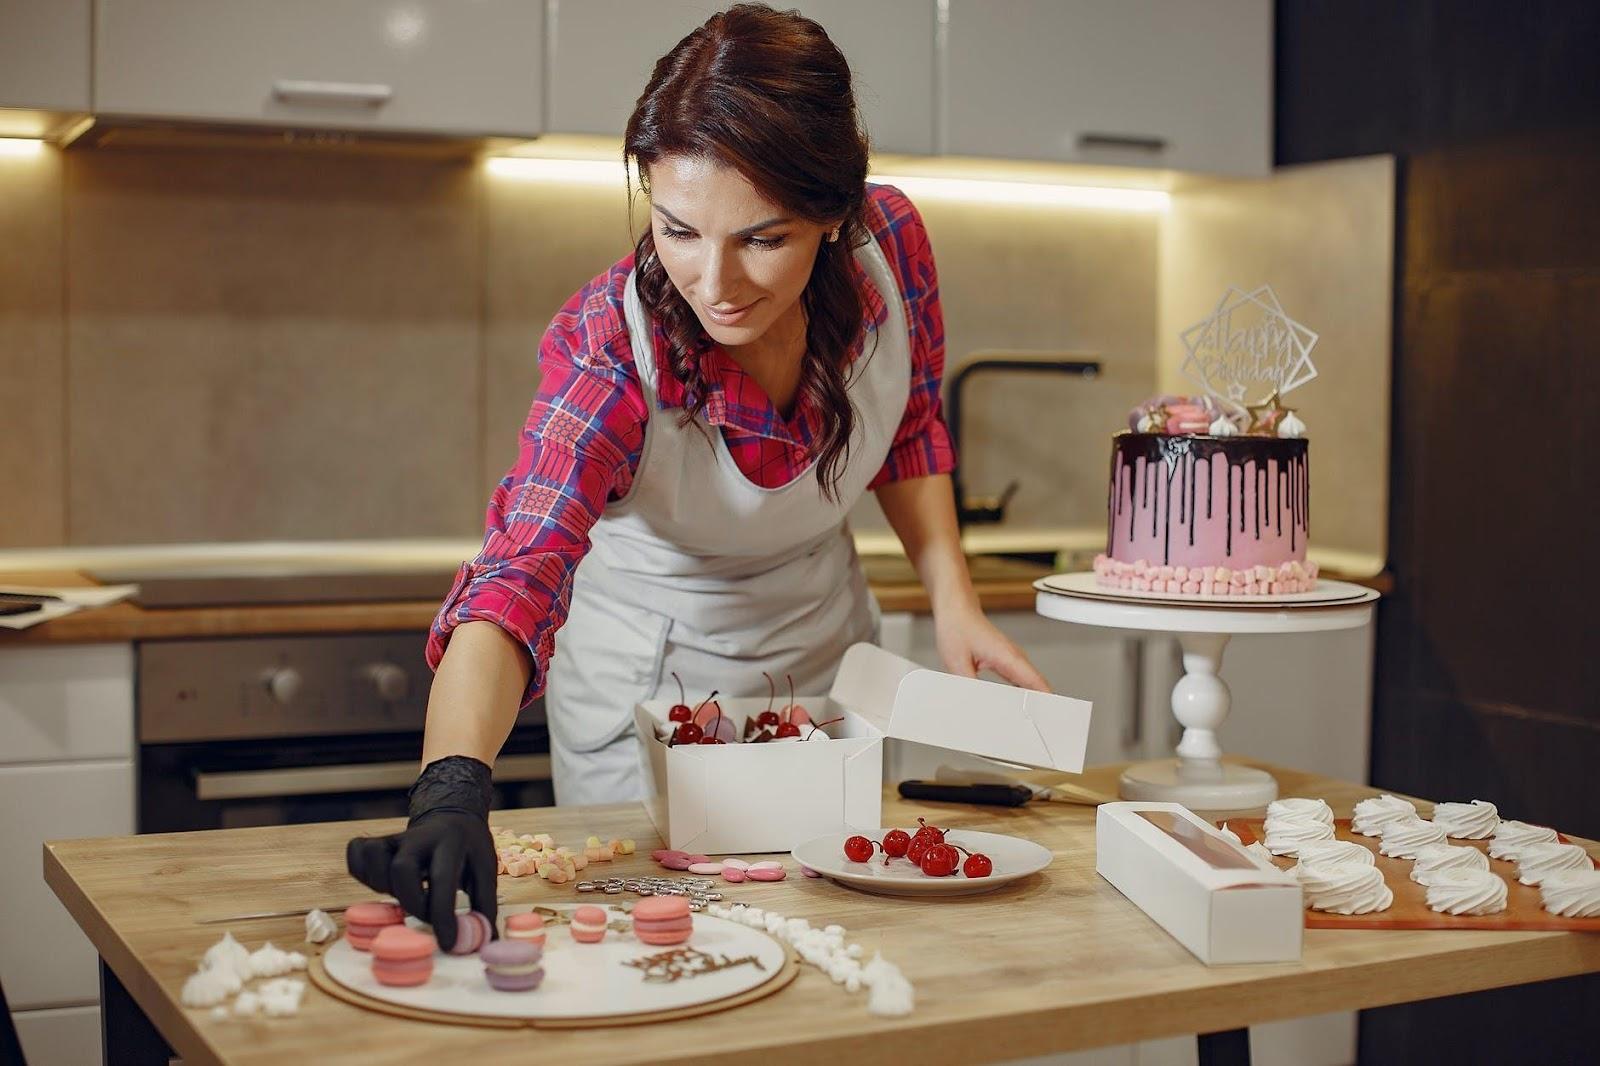 Romantic ways to thank husband